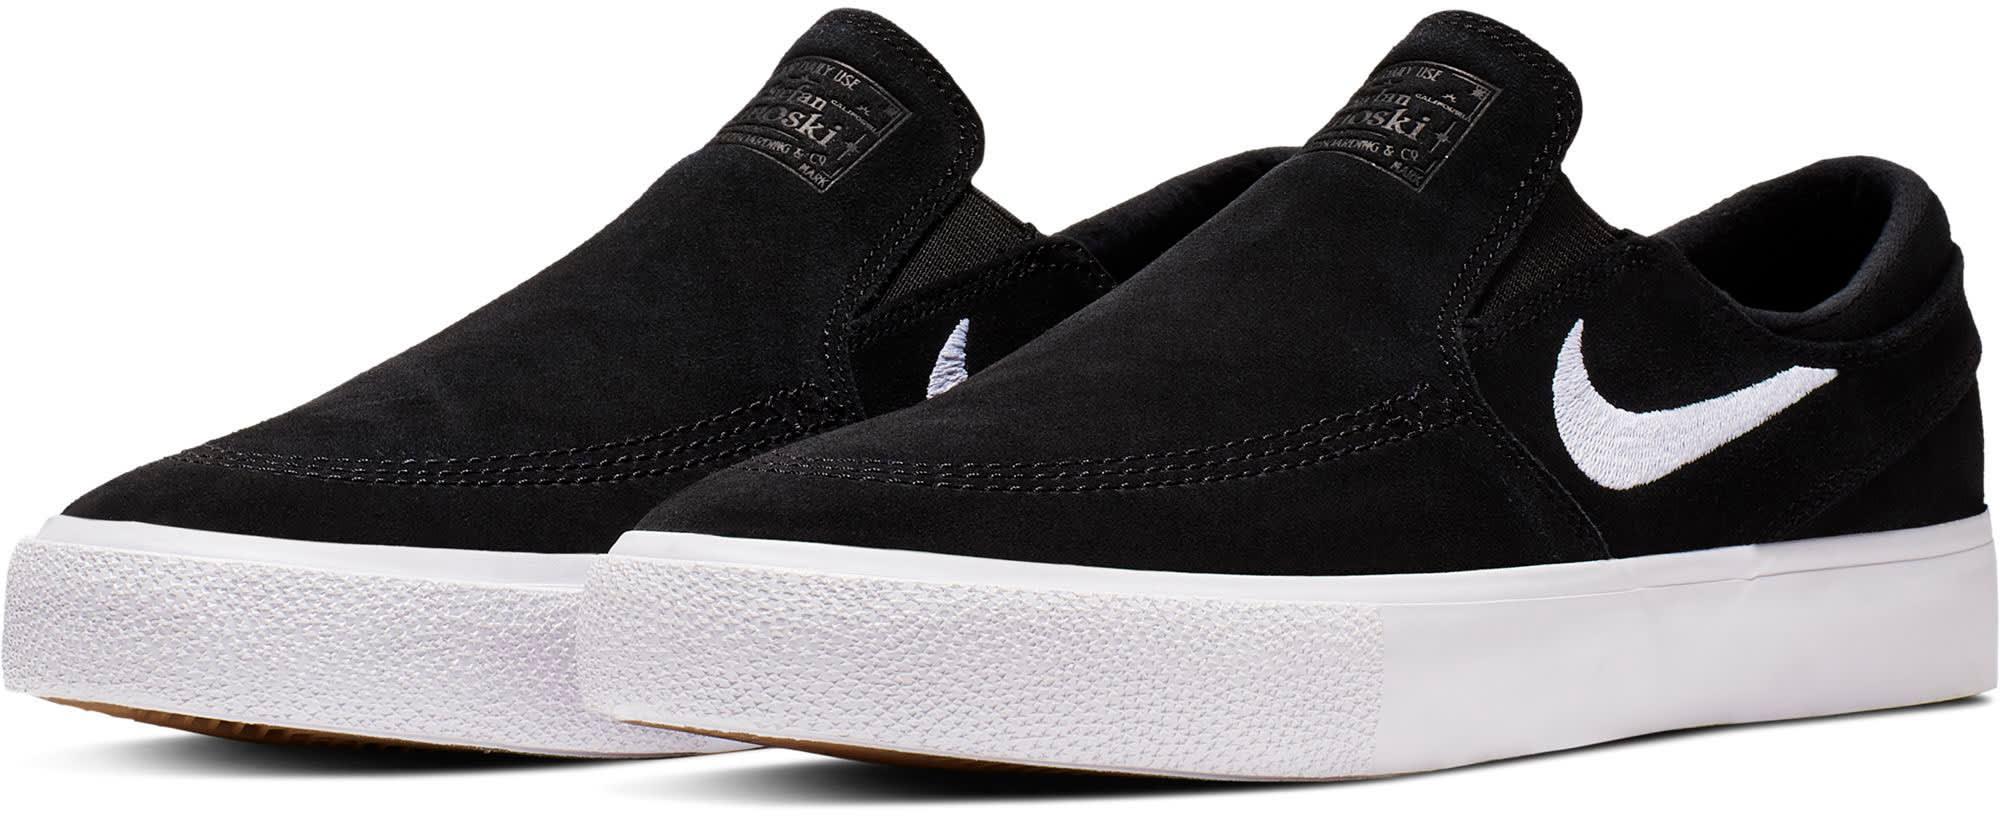 premium selection aee41 0c1d7 Nike SB Zoom Stefan Janoski Slip RM Skate Shoes - thumbnail 3